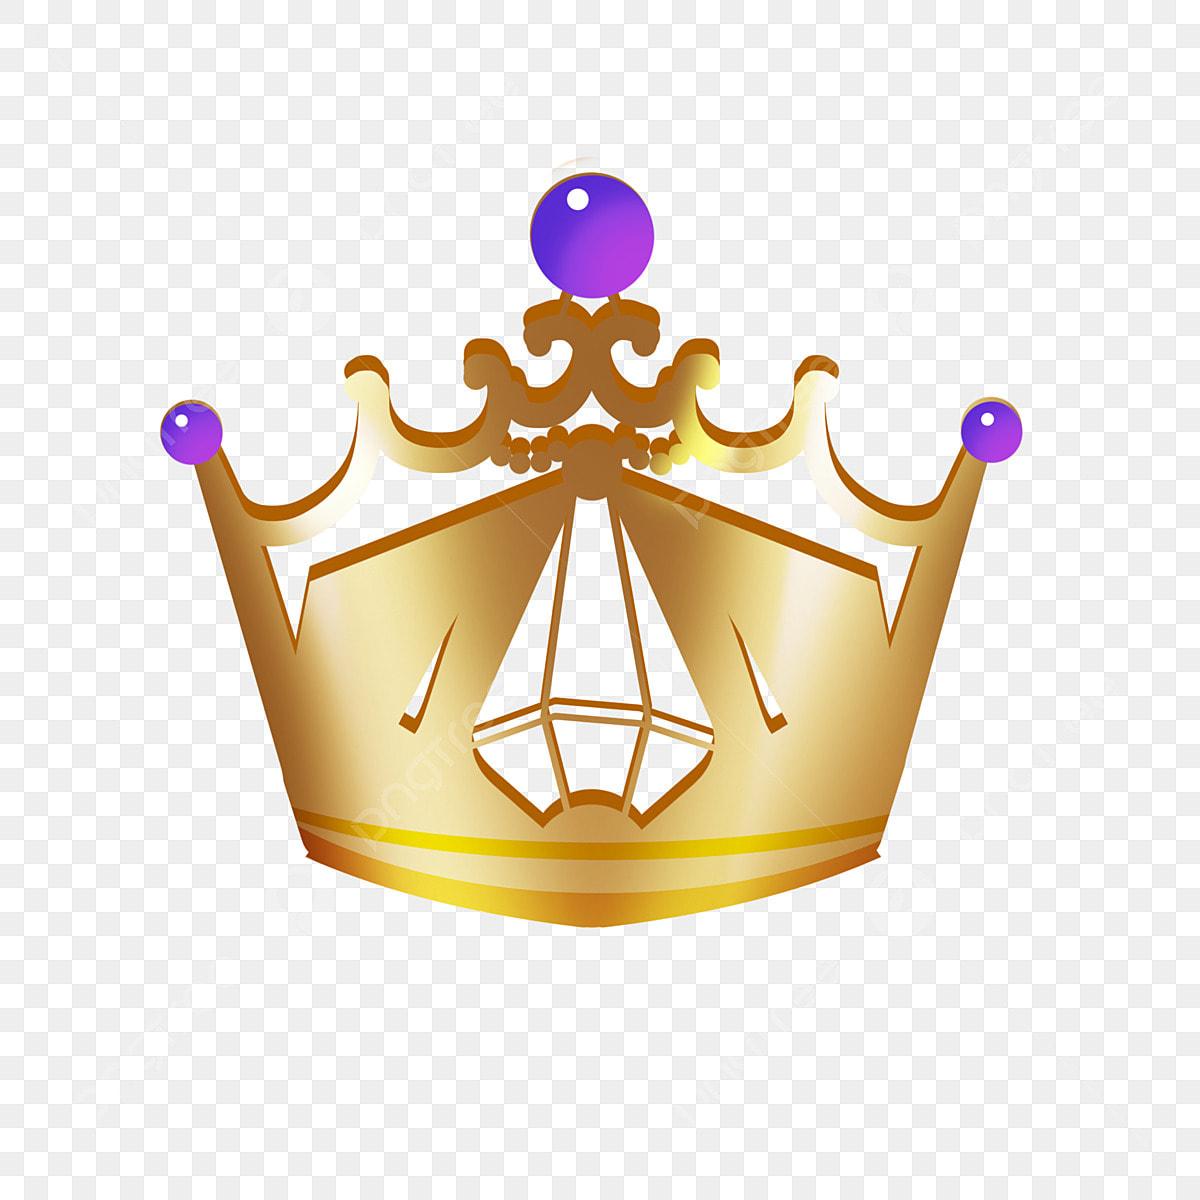 Couronne Princesse Princesse Couronne Pourpre Pierre Precieuse